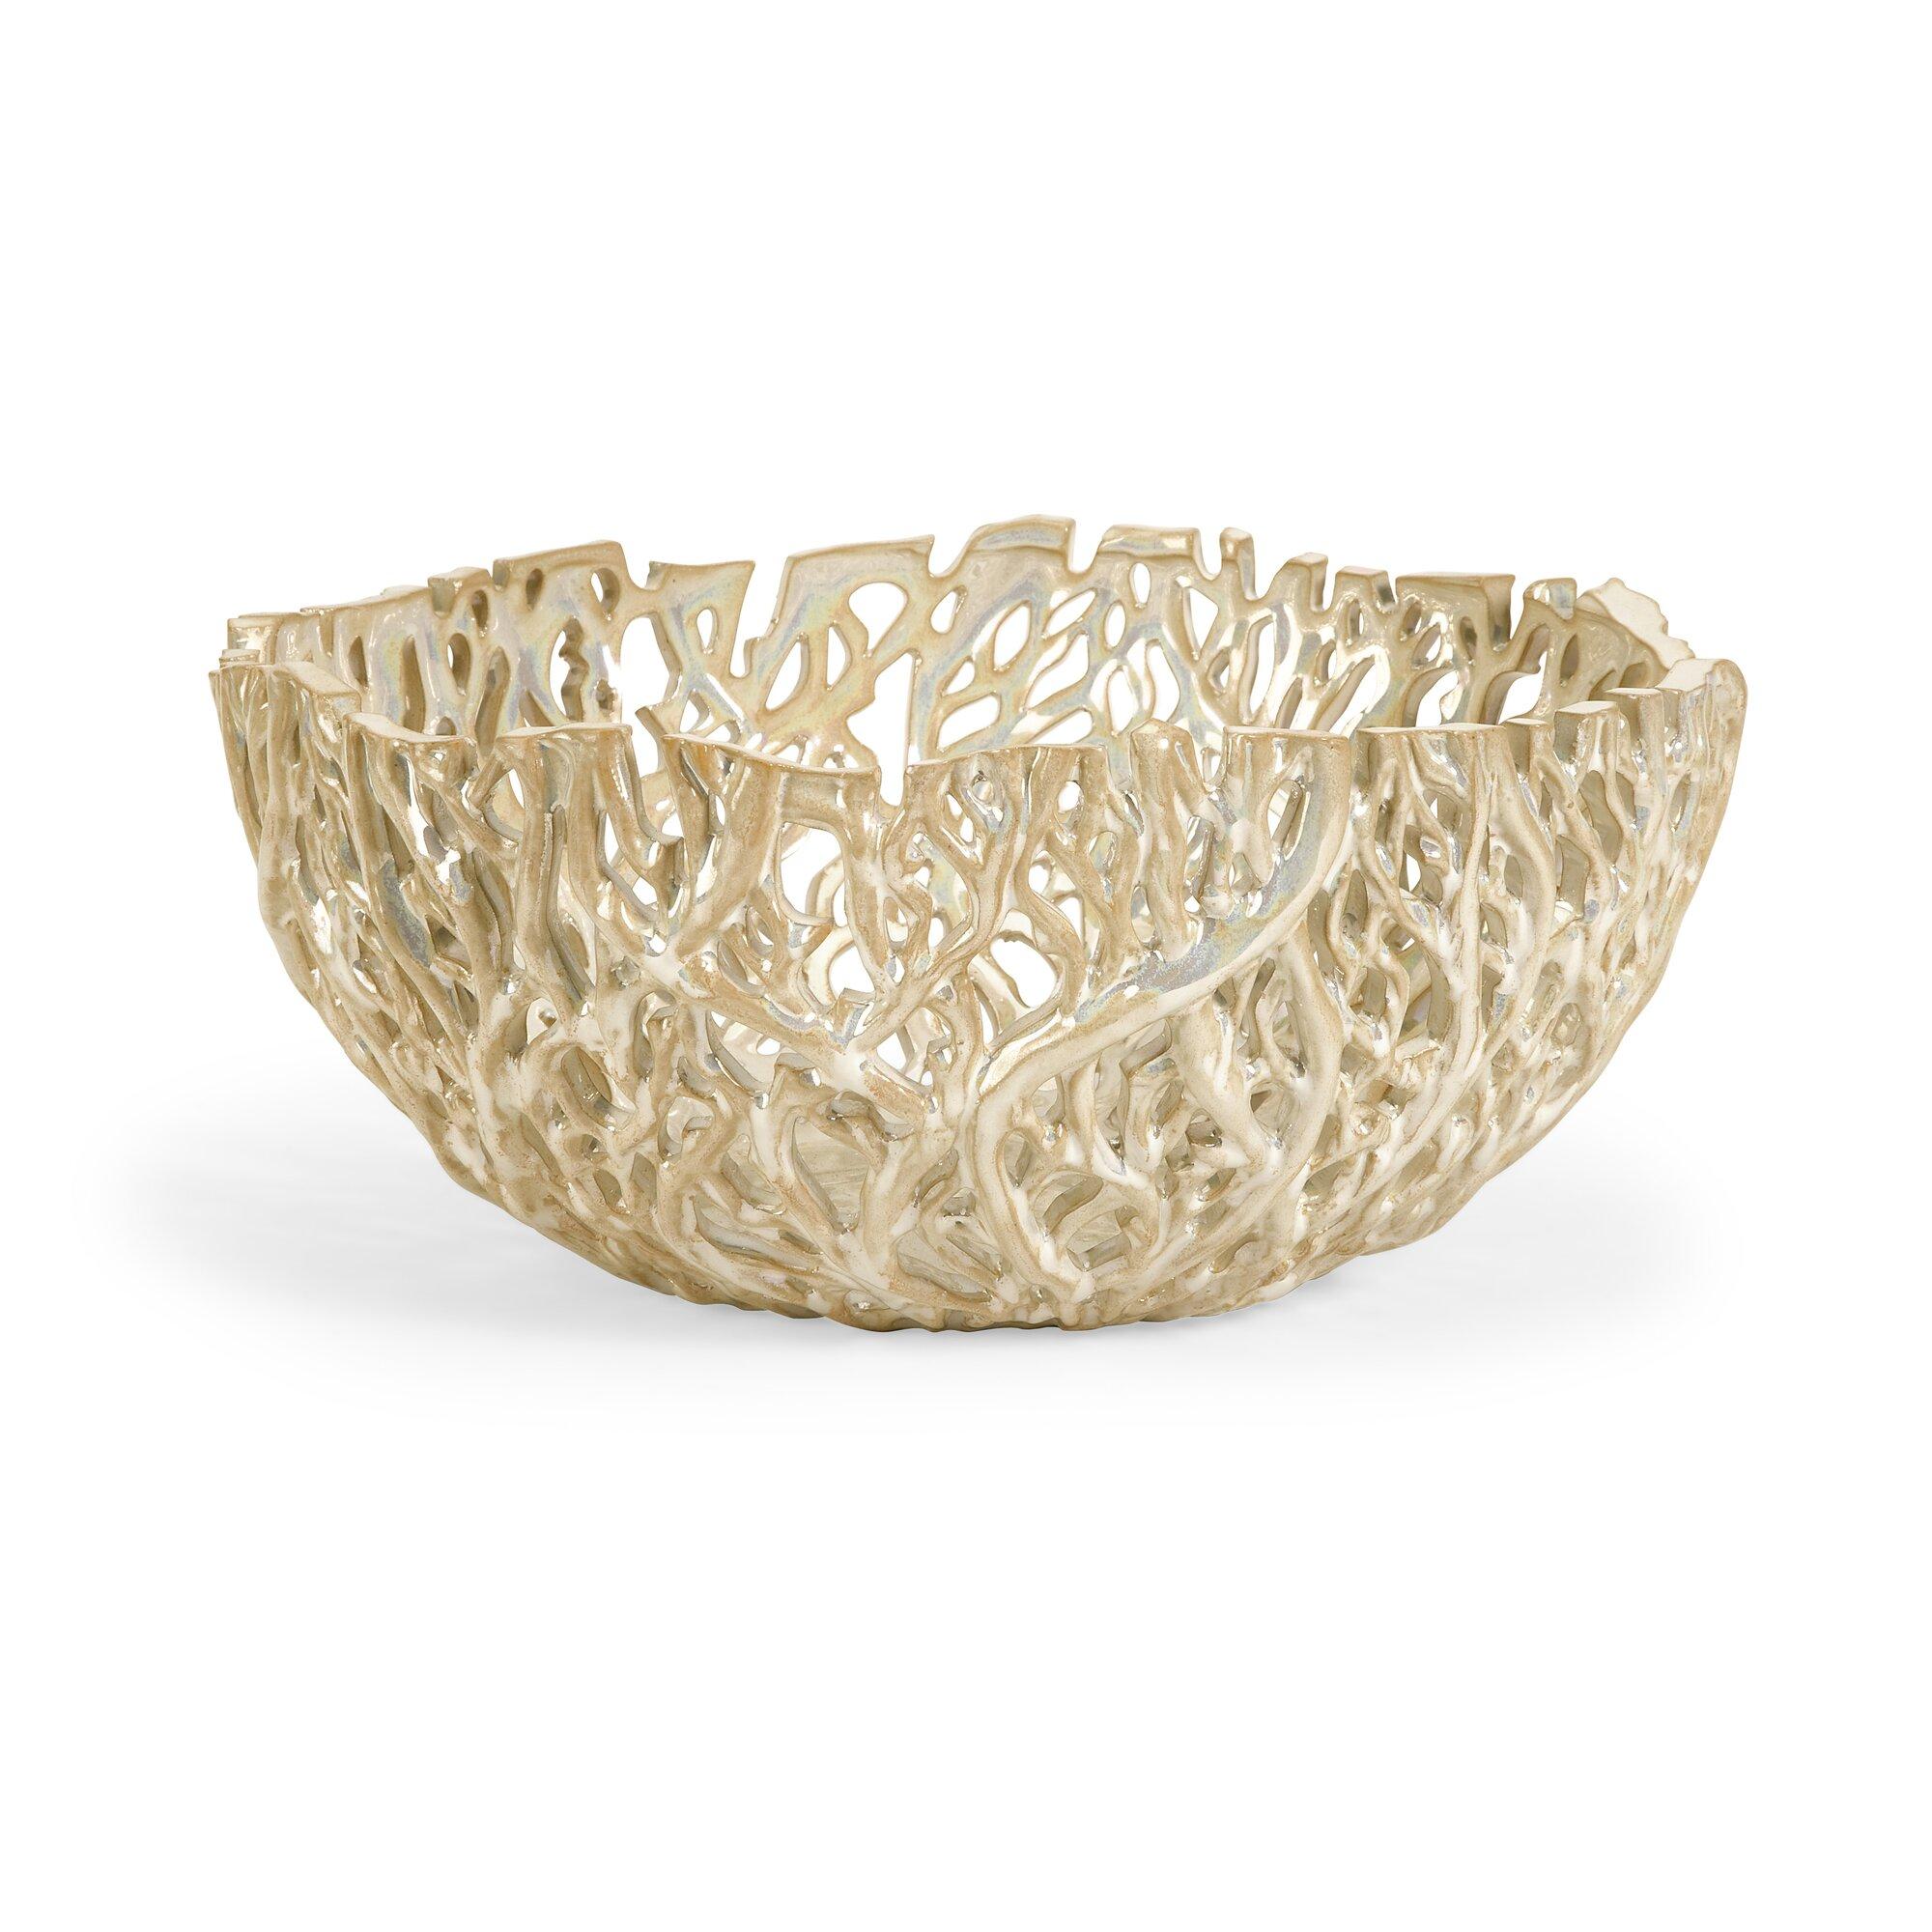 vargas cutwork decorative bowl - Decorative Bowl